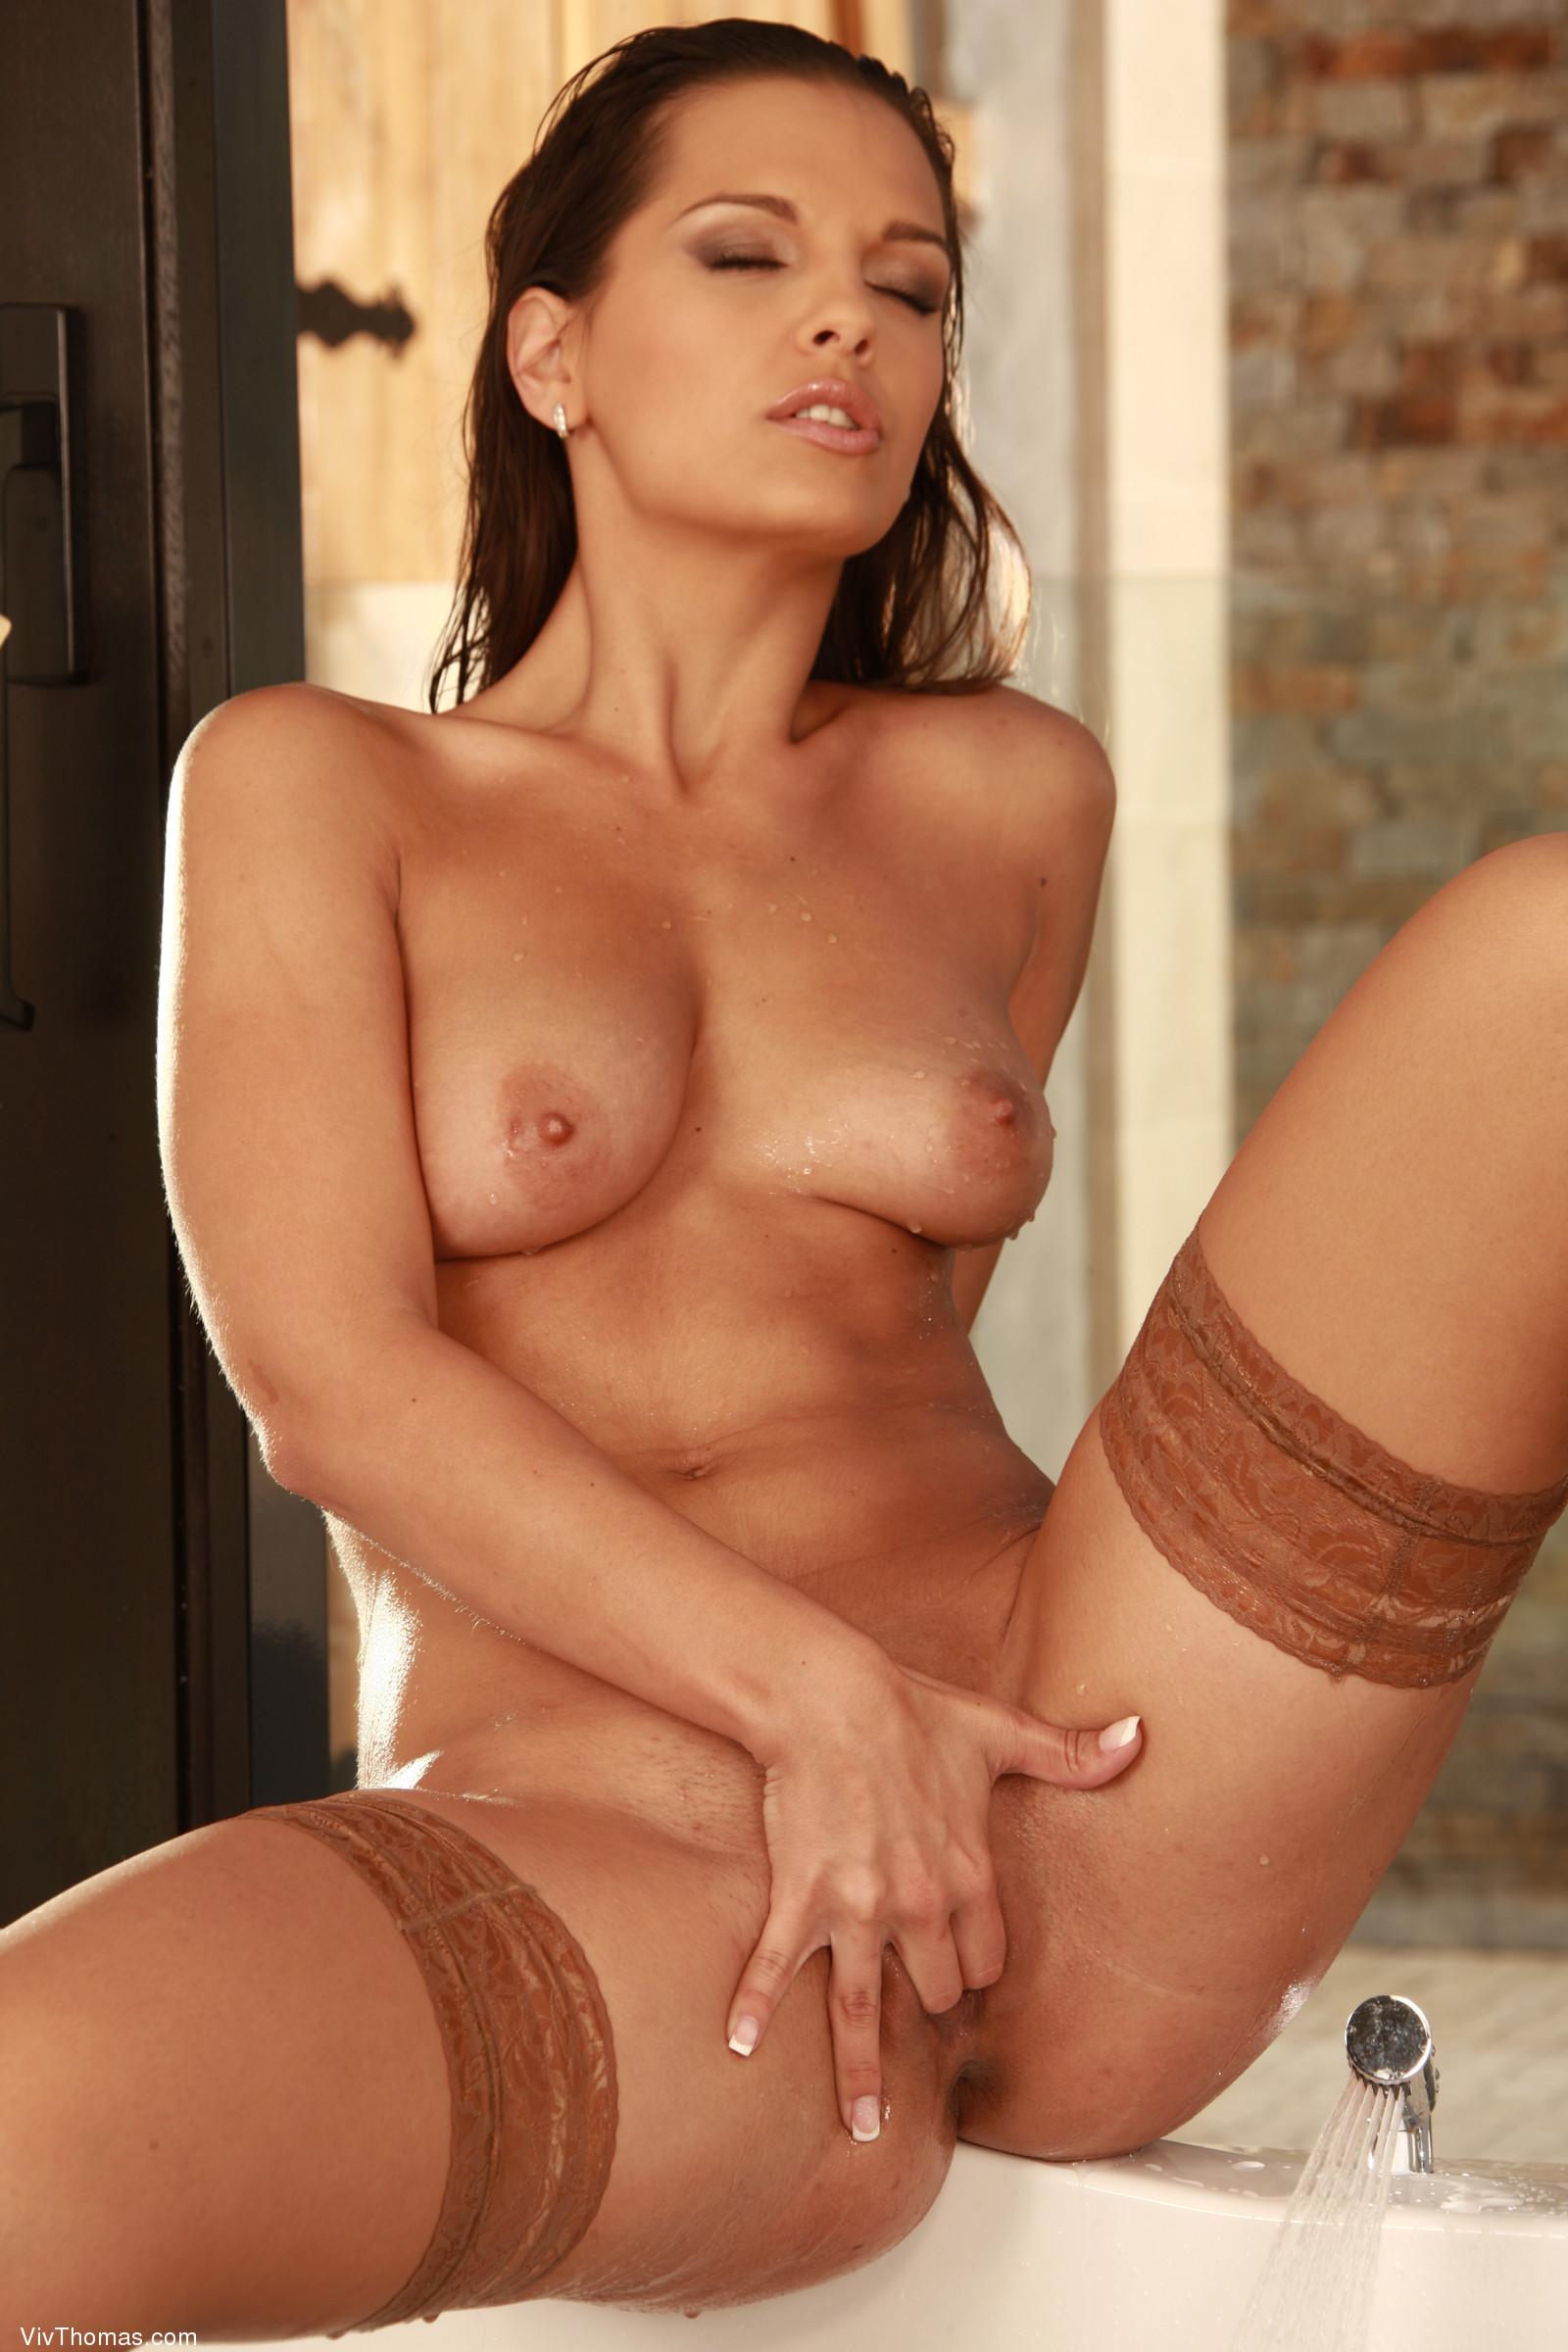 Patricia Porno Star hungarian porn star image - xxxpicss